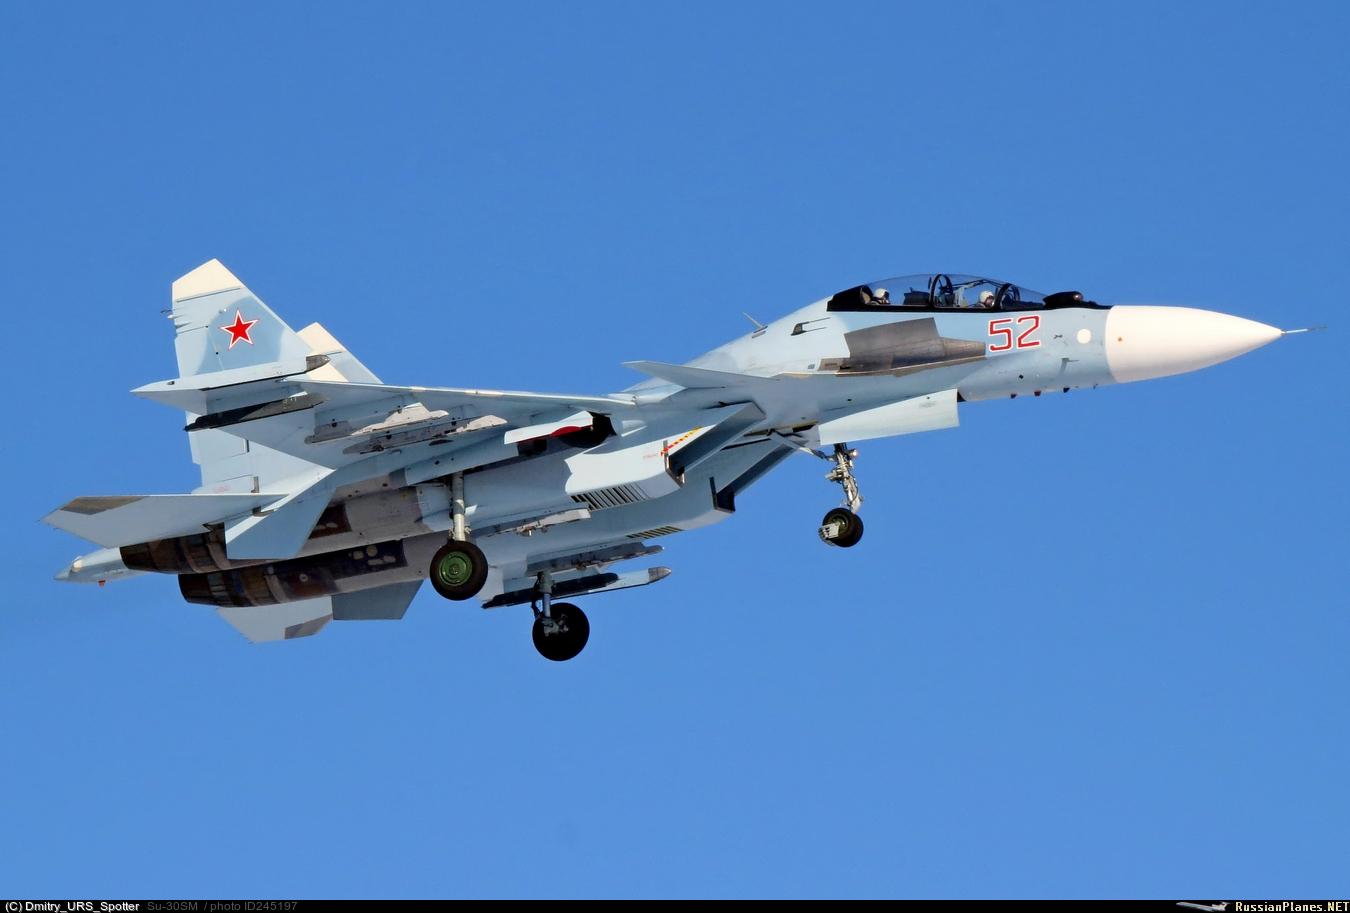 https://russianplanes.net/images/to246000/245197.jpg